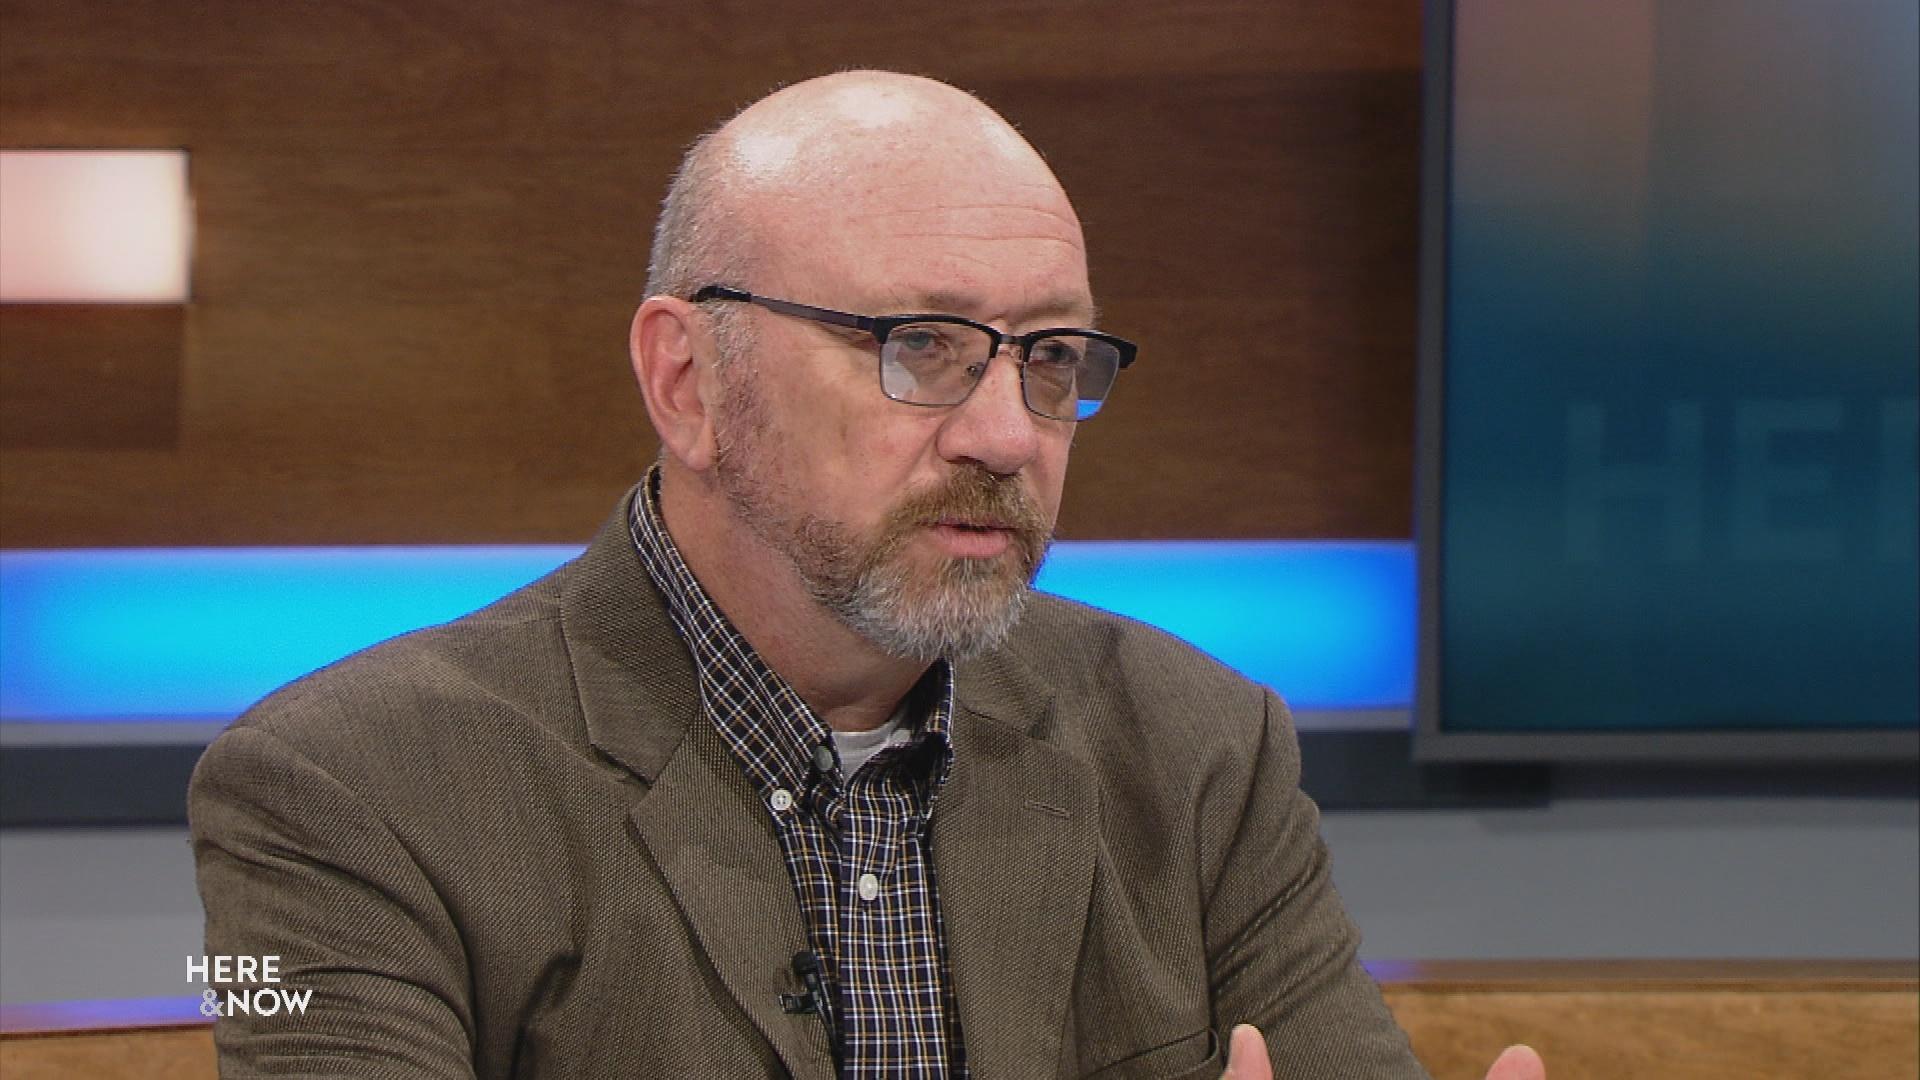 Wisconsinites Owe Billions in Unpaid Medical Bills